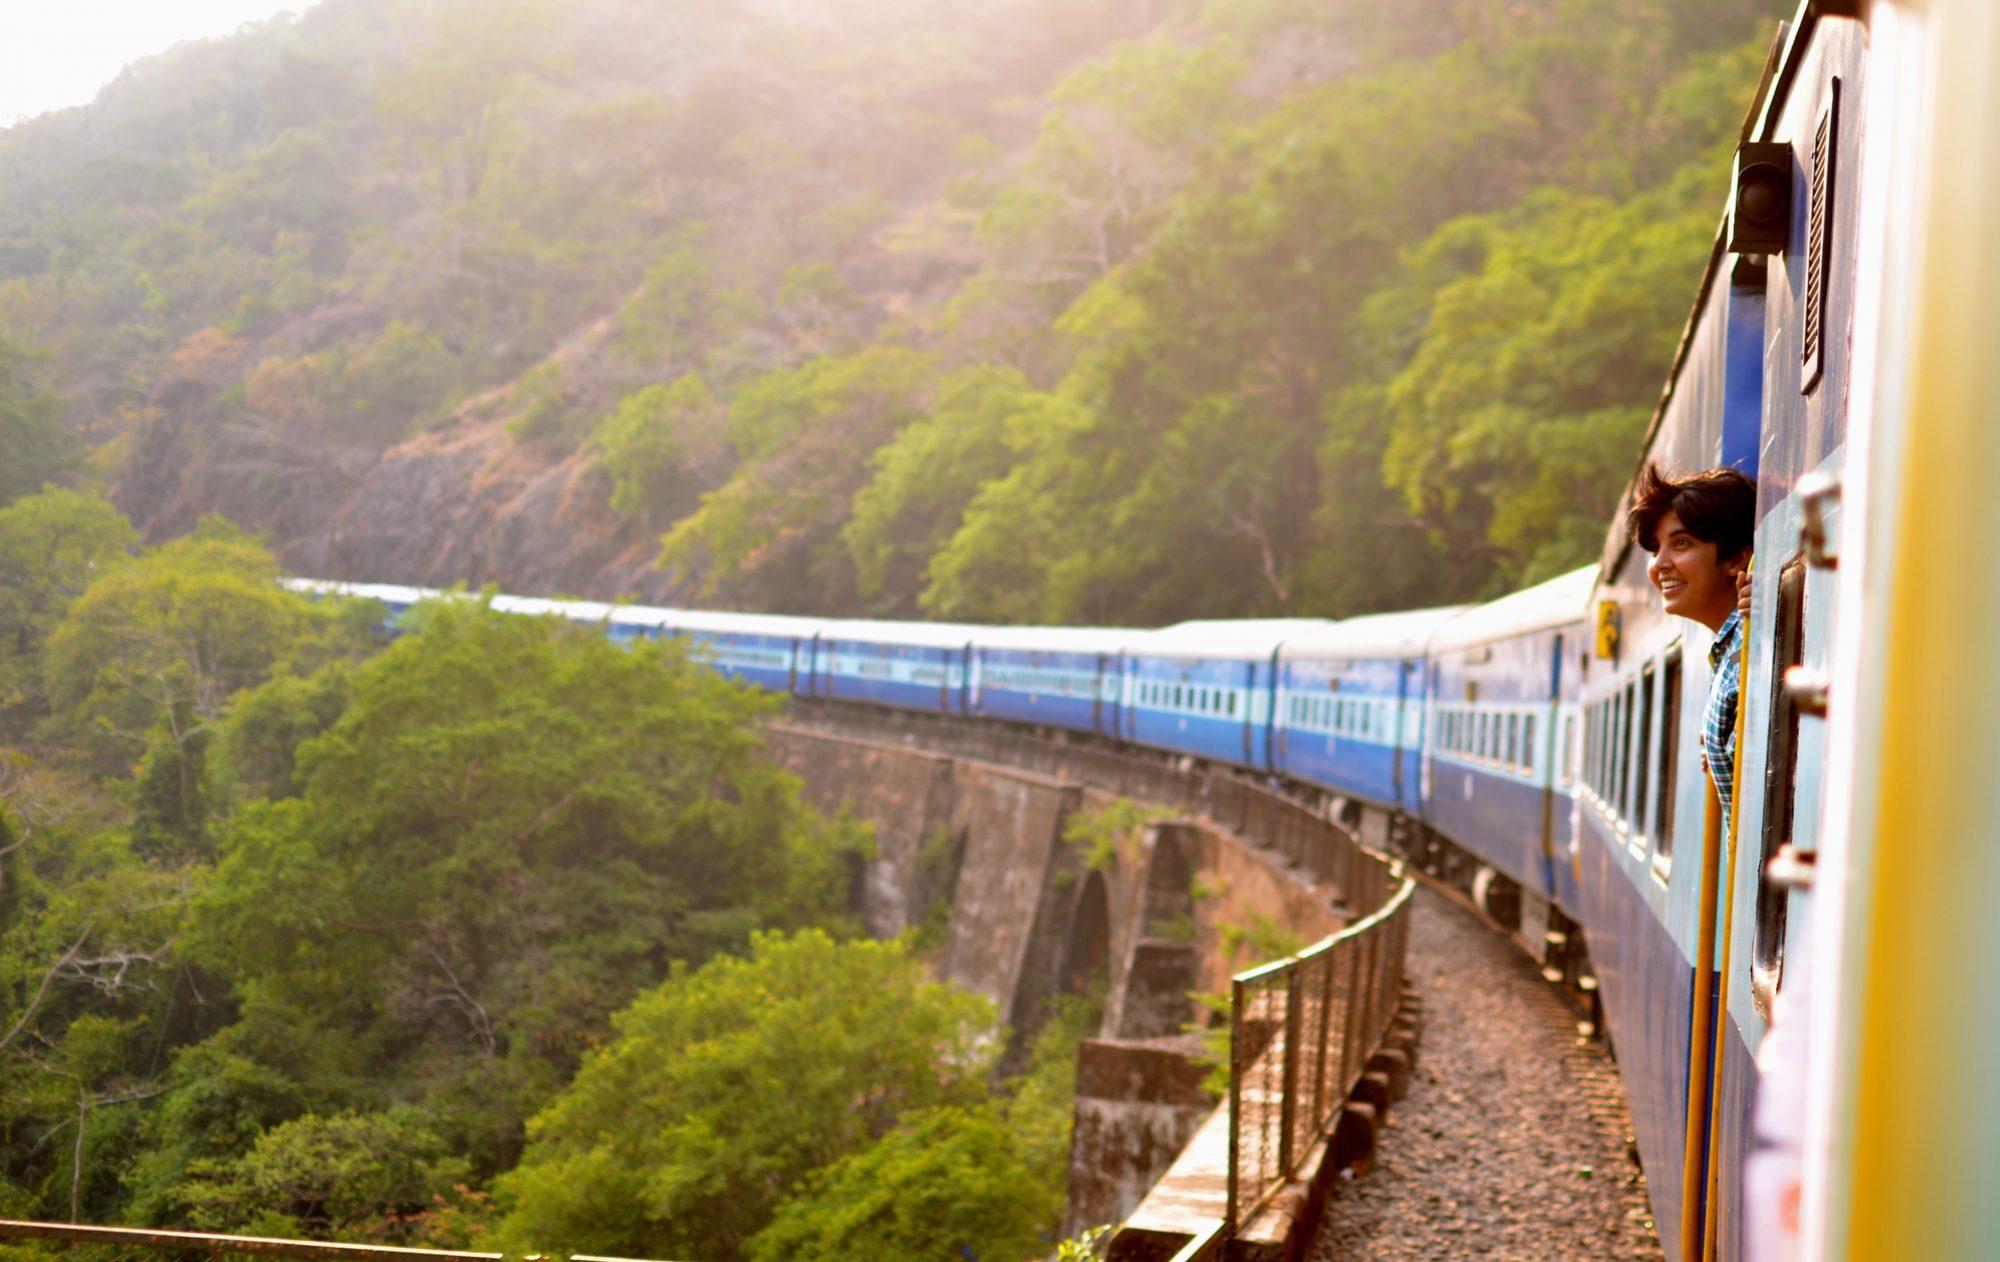 viajargratis_tren_europa